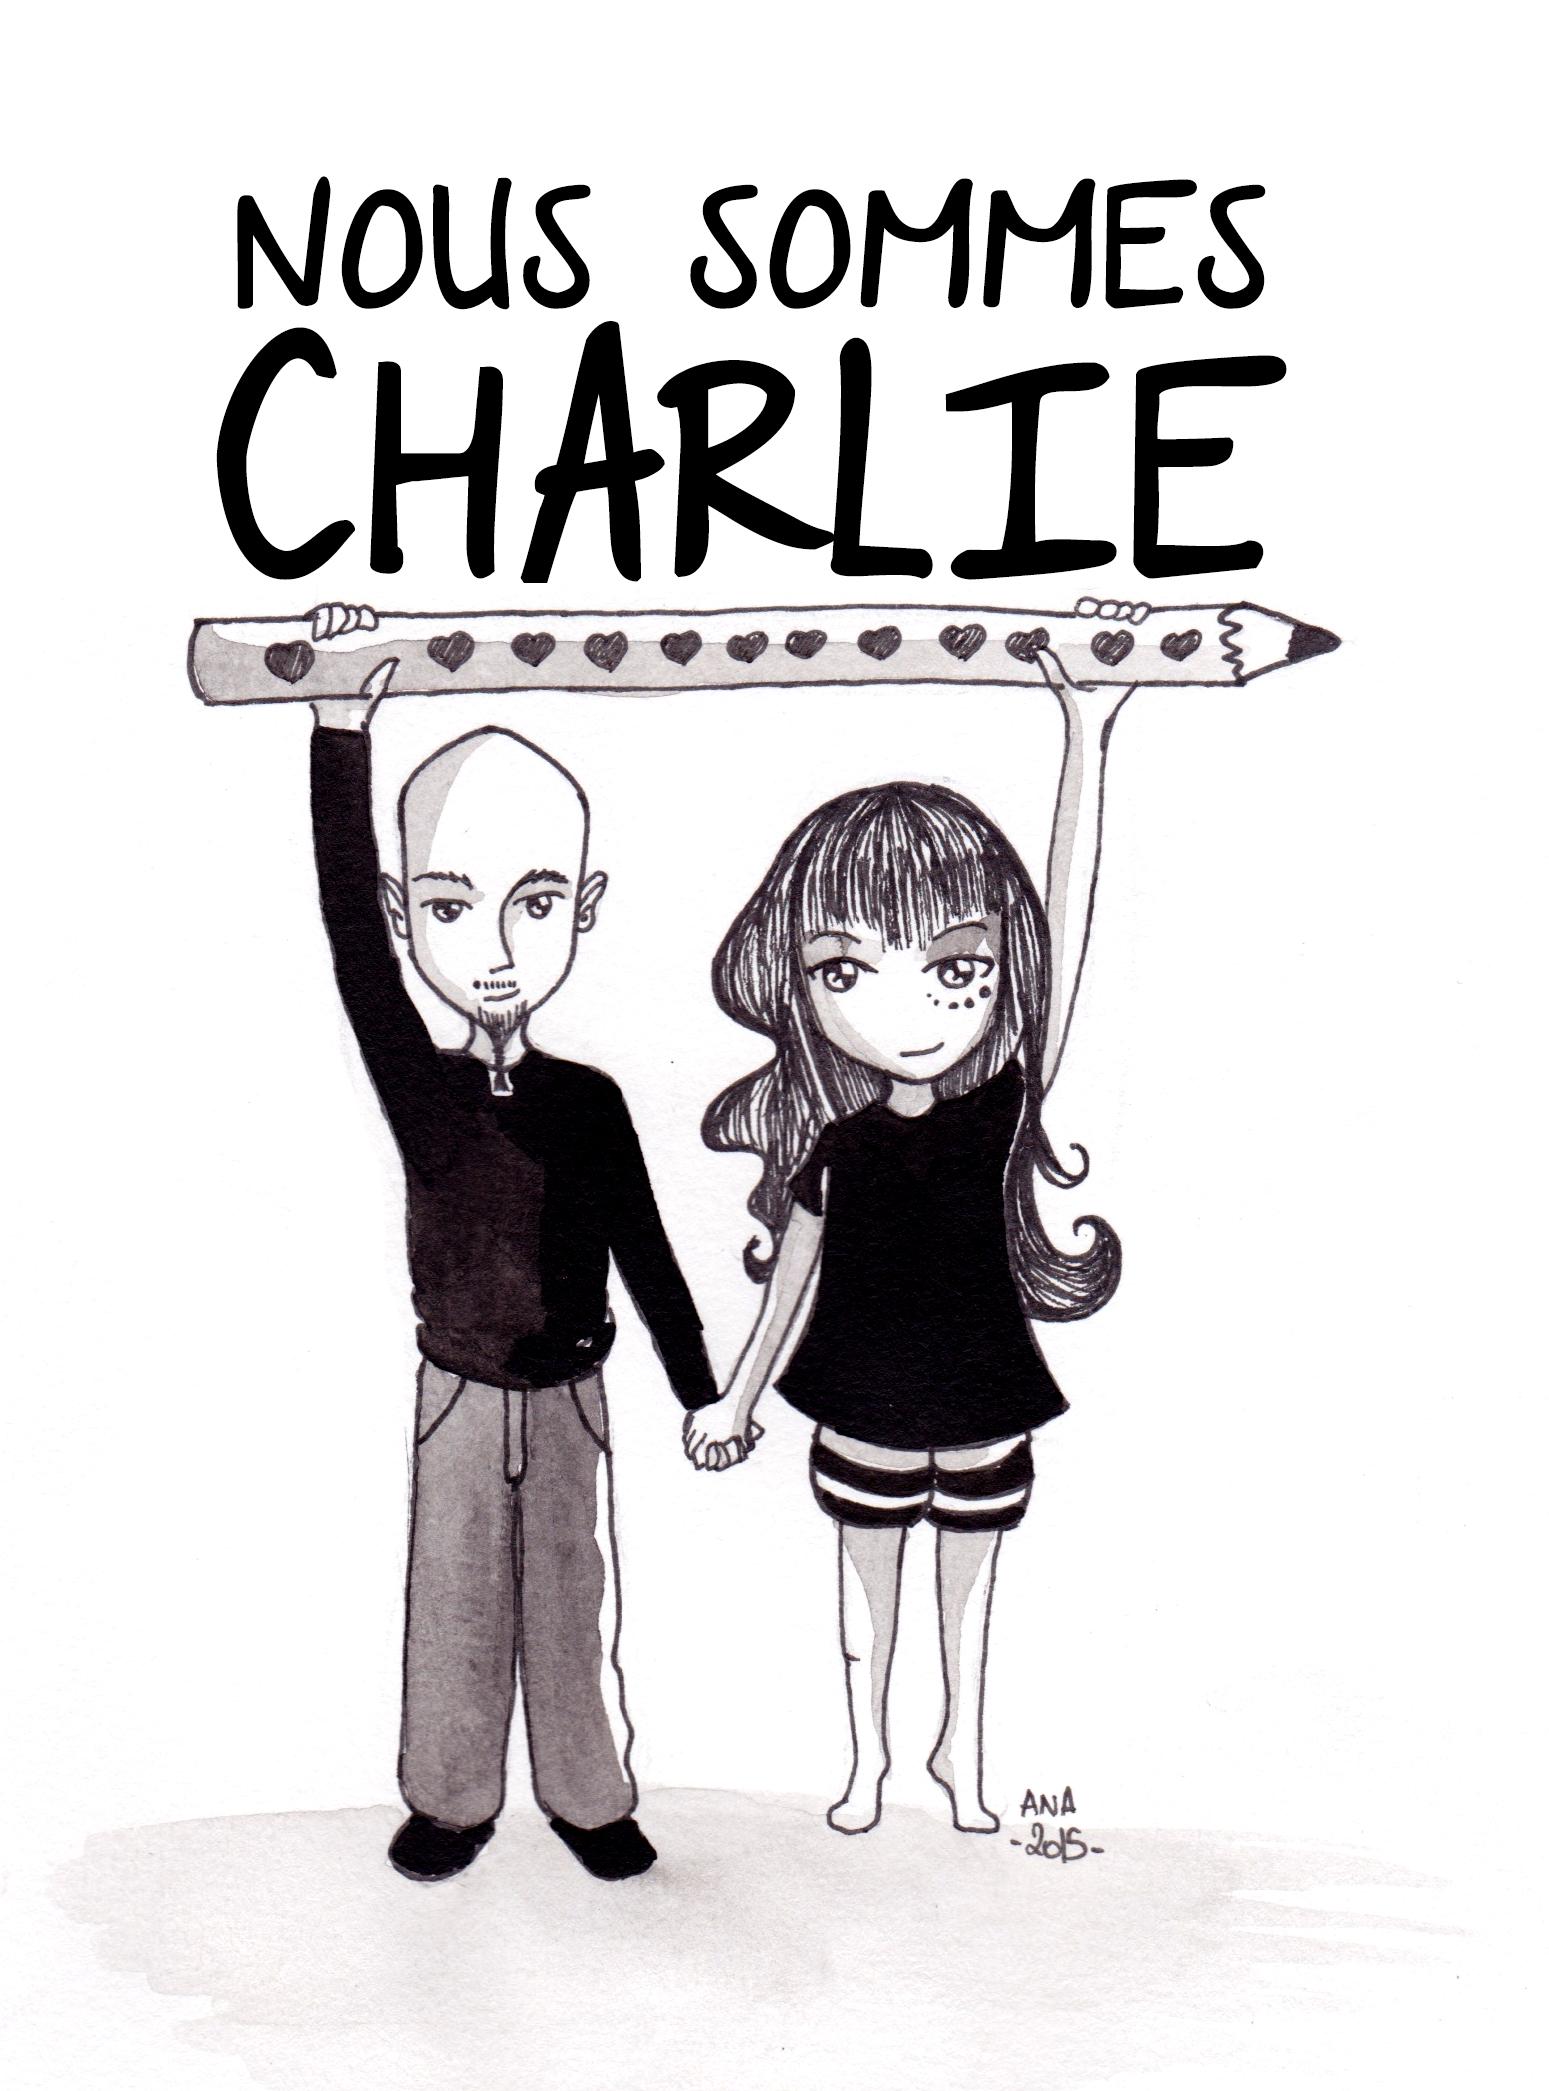 Charlie-MRudy